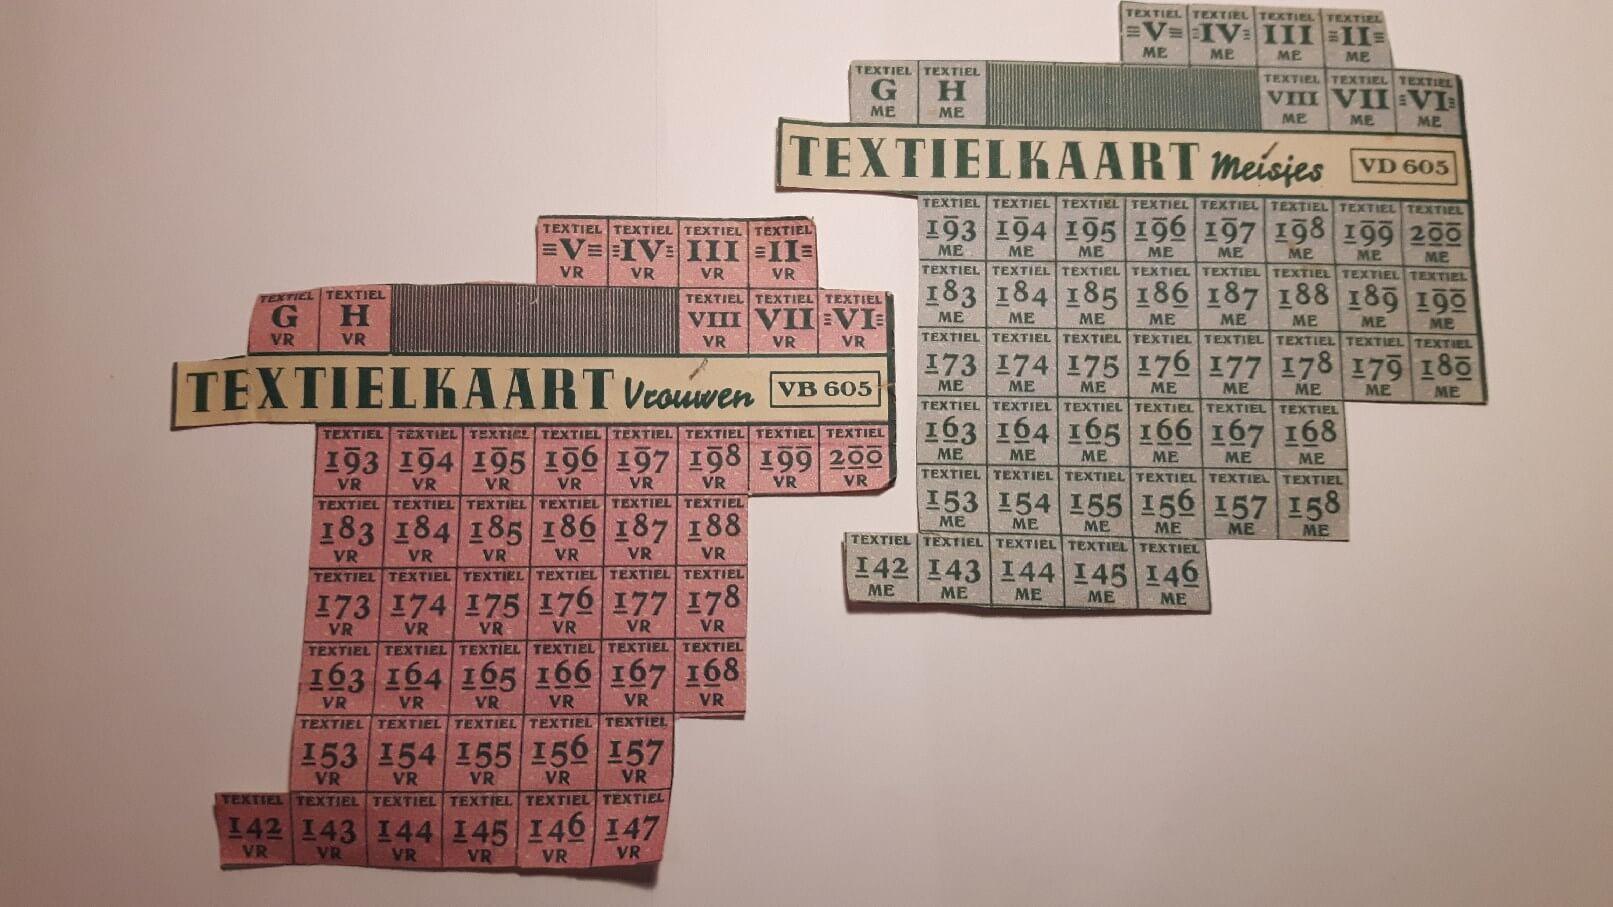 textielkaart meisjes en vrouwen distributiebonnen